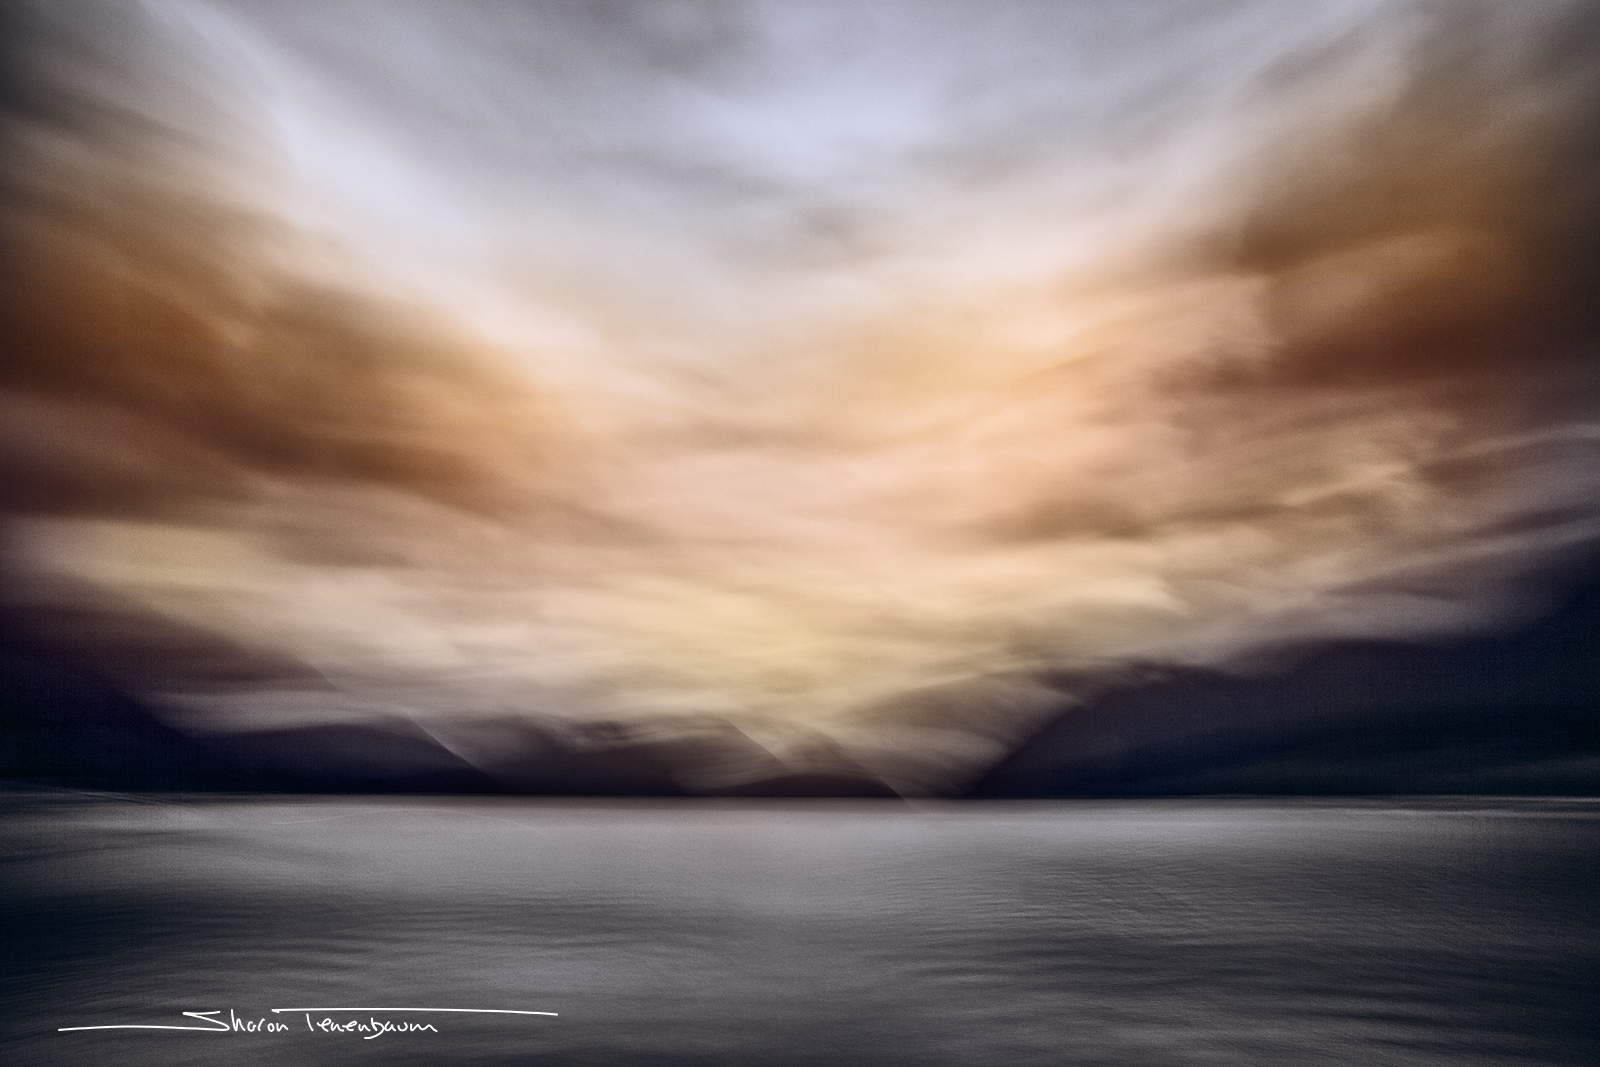 Landscape Image using ICM (Intentional Camera Movement)